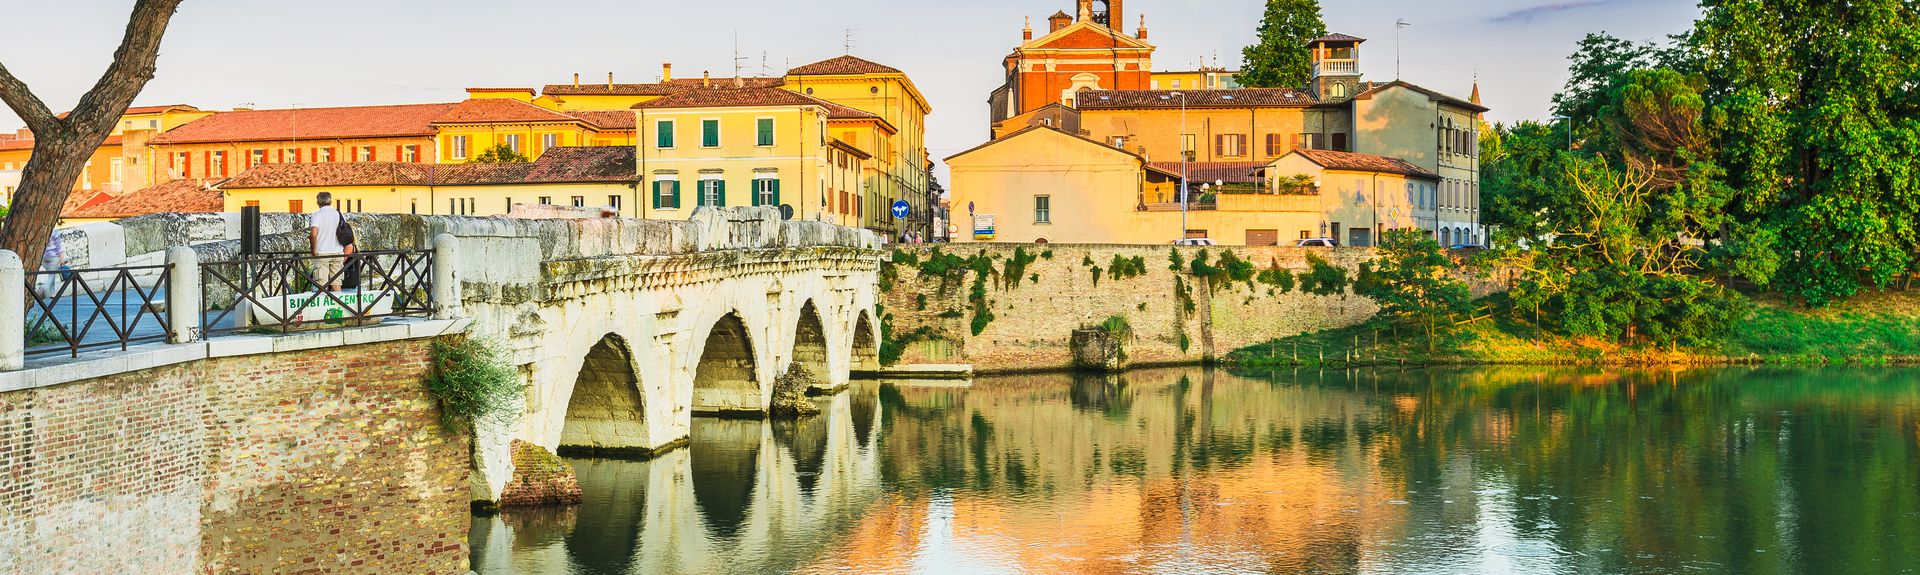 Provincia di Rimini, Emilia Romagna, Italia